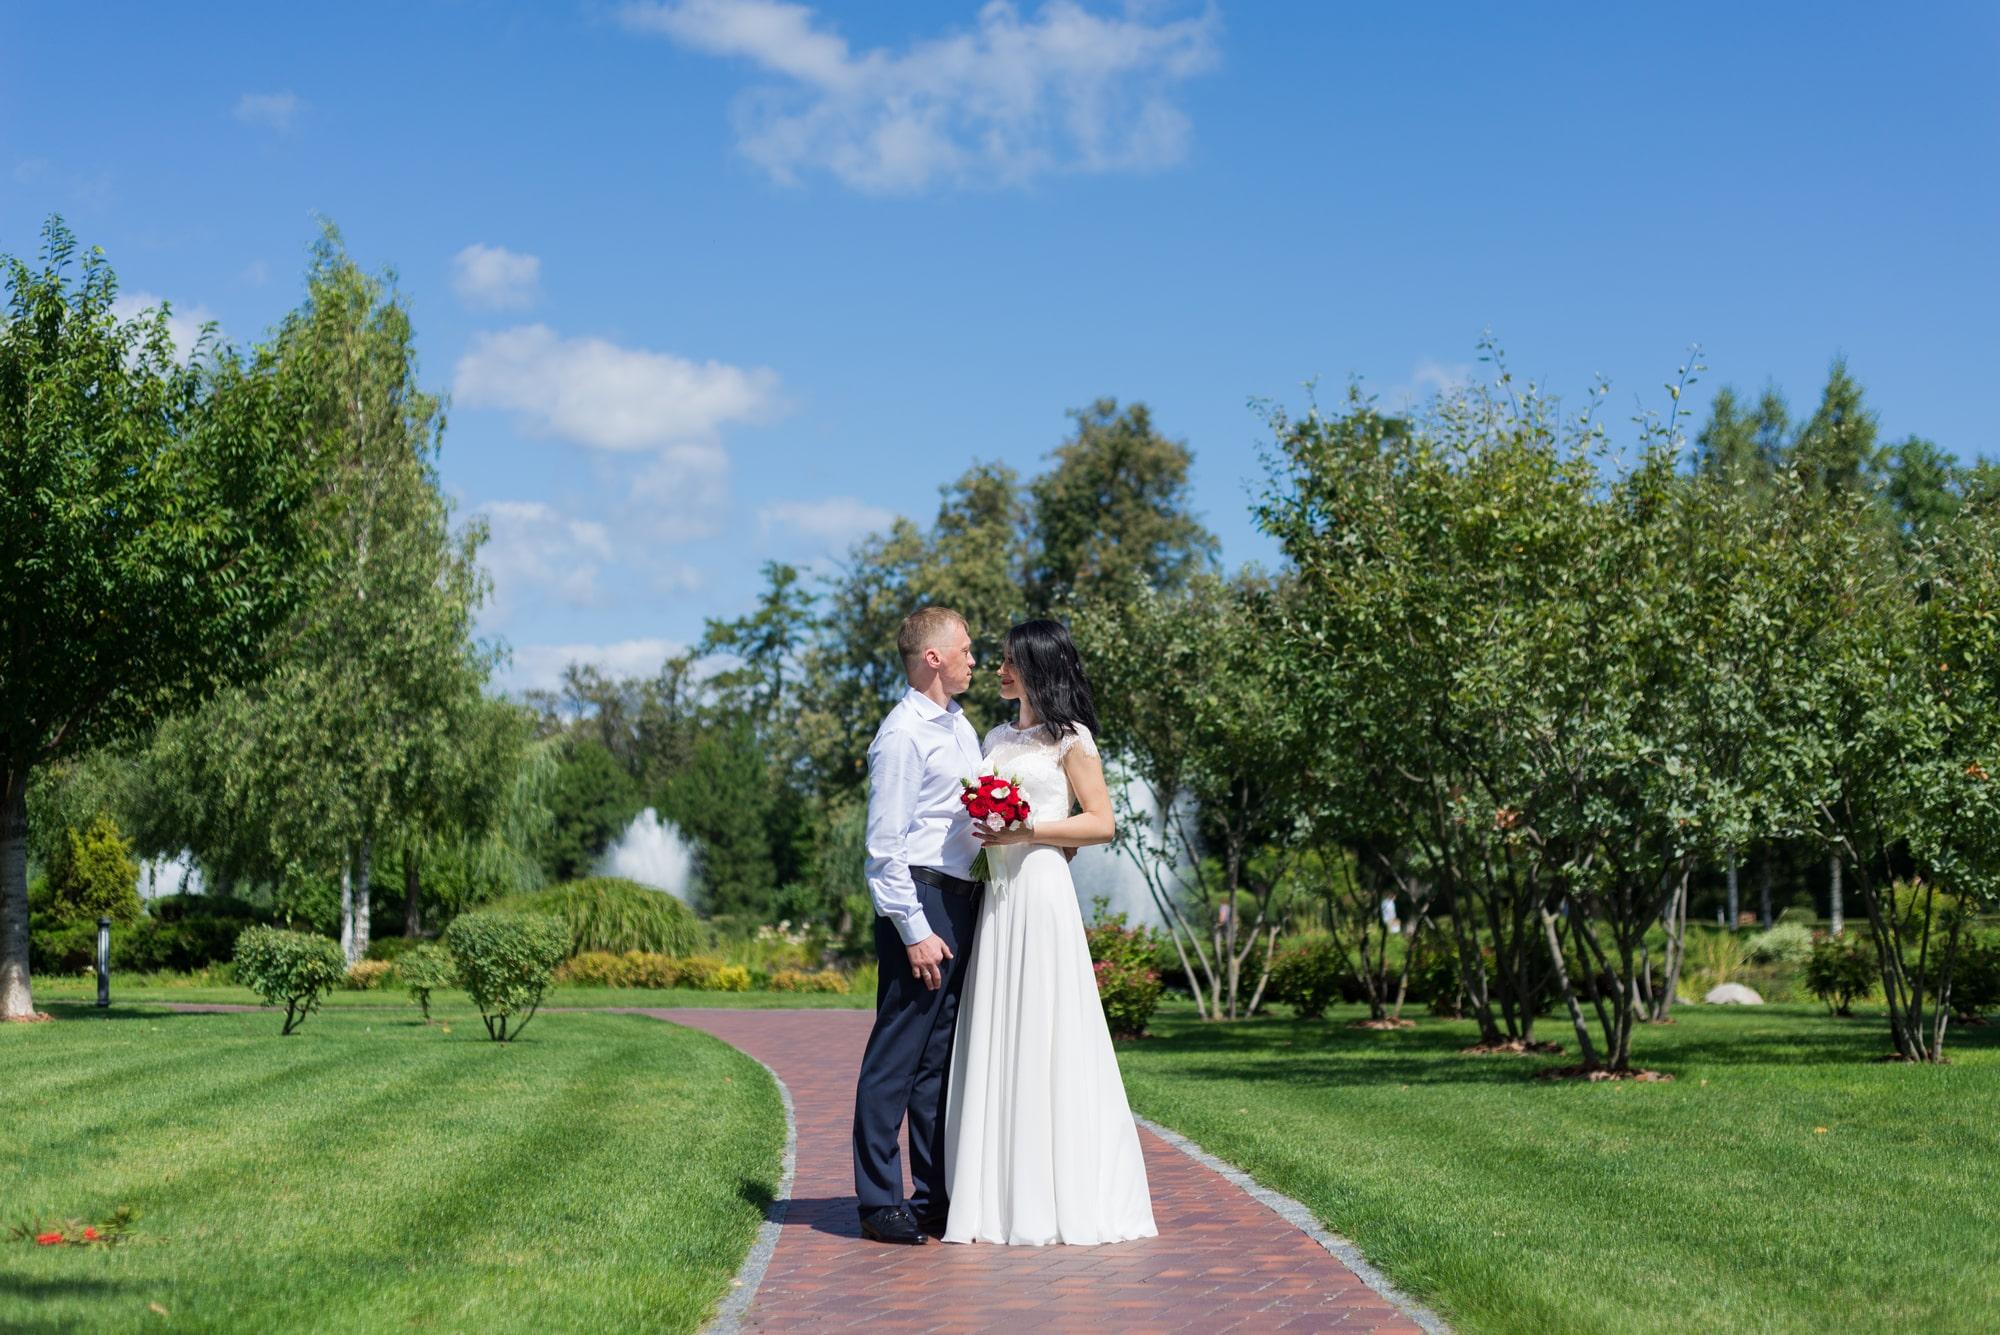 Свадебная фотосъемка в августе - на лужайке